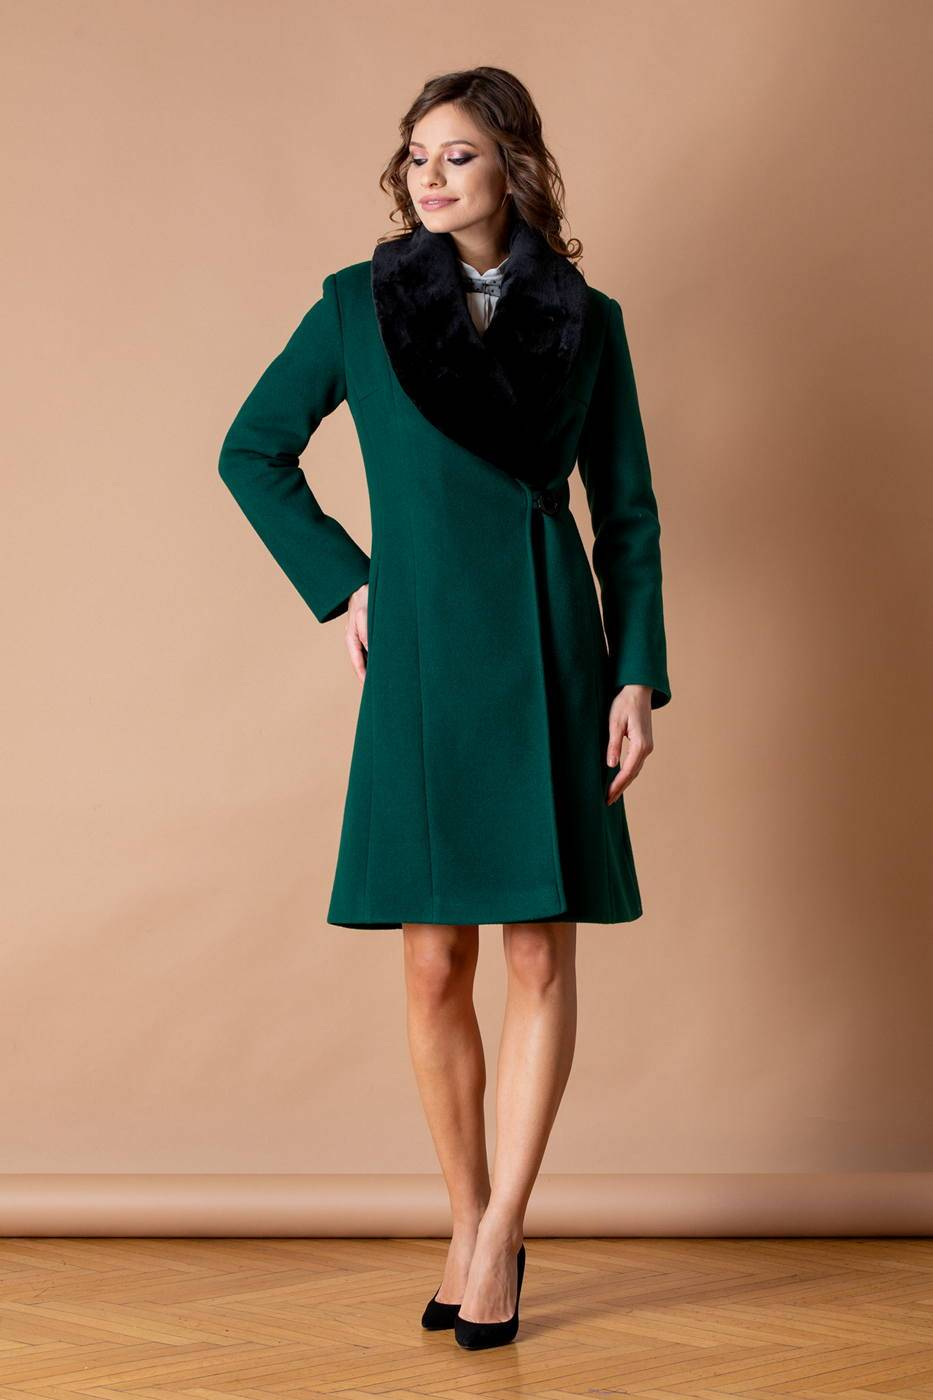 Vogue Πράσινο Παλτό 5297